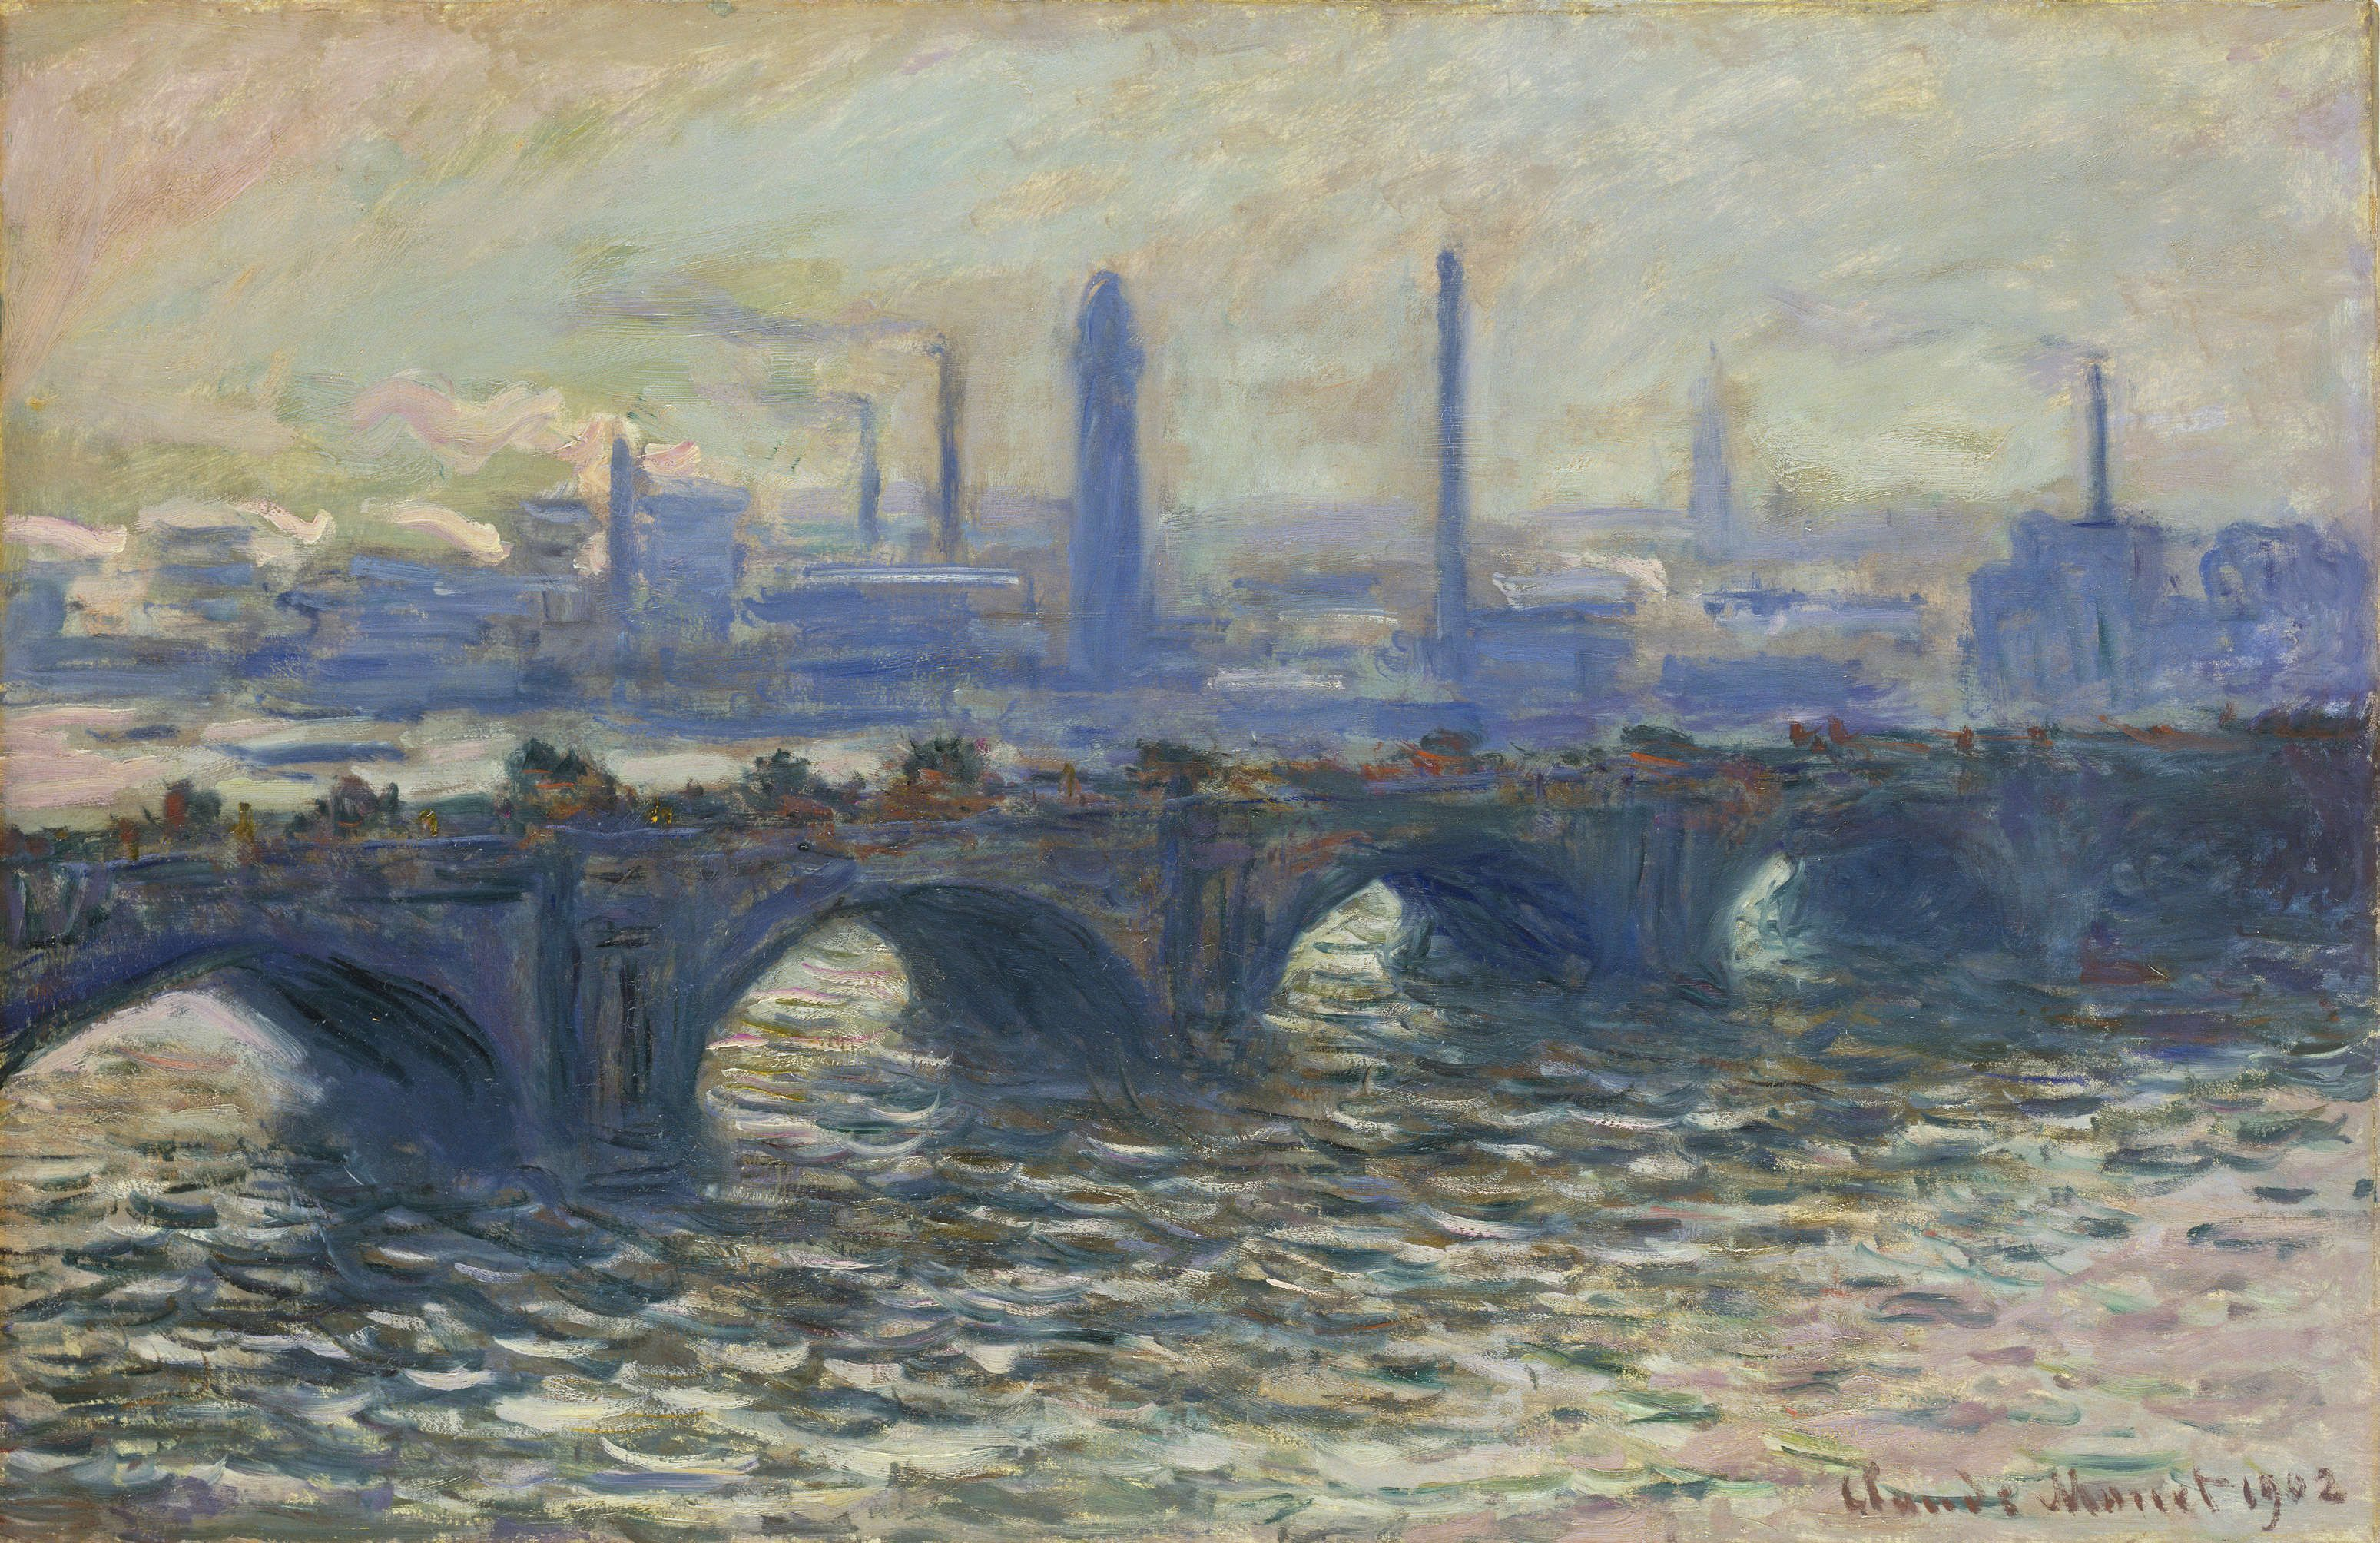 Claude Monet (1840–1926), Die Waterloo-Brücke, 1902, Öl auf Leinwand, 65 x 100 cm (© Hamburger Kunsthalle / bpk, Foto: Elke Walford)